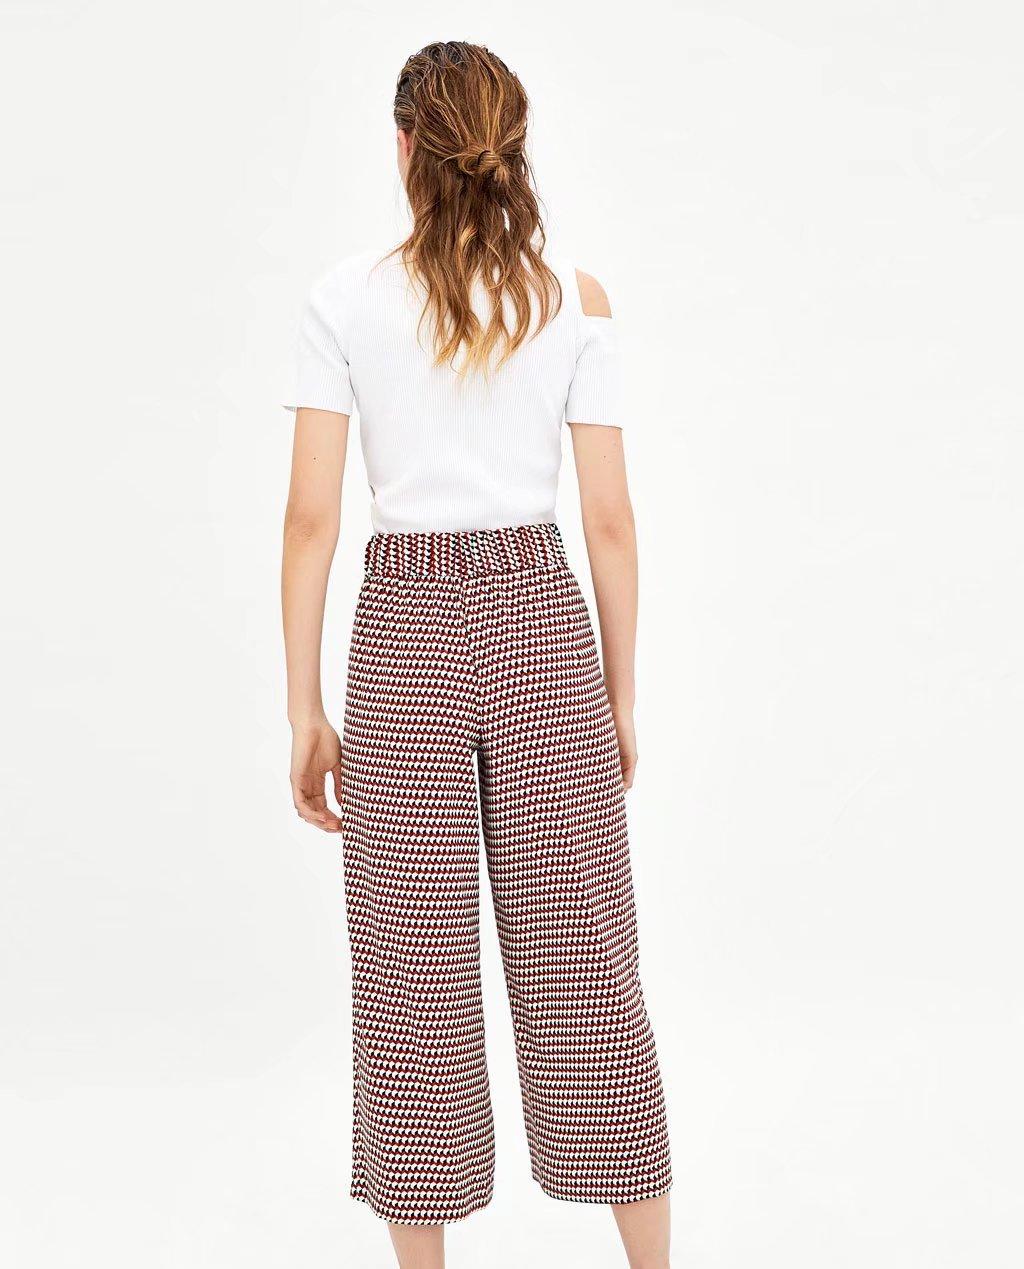 Polyester Fashionpants(Picture color -S) NHAM2195-Picture color -S